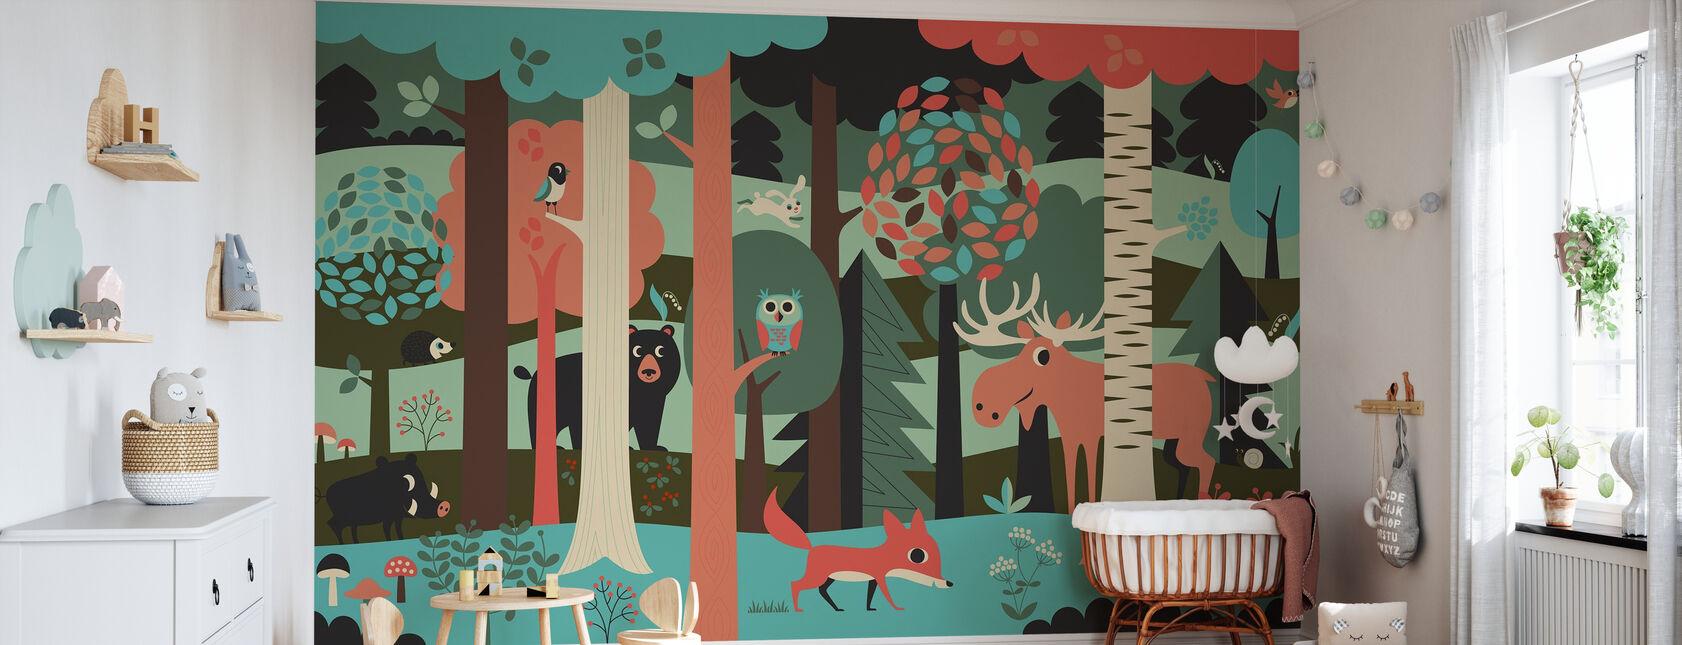 In het bos - Turkoois - Behang - Babykamer